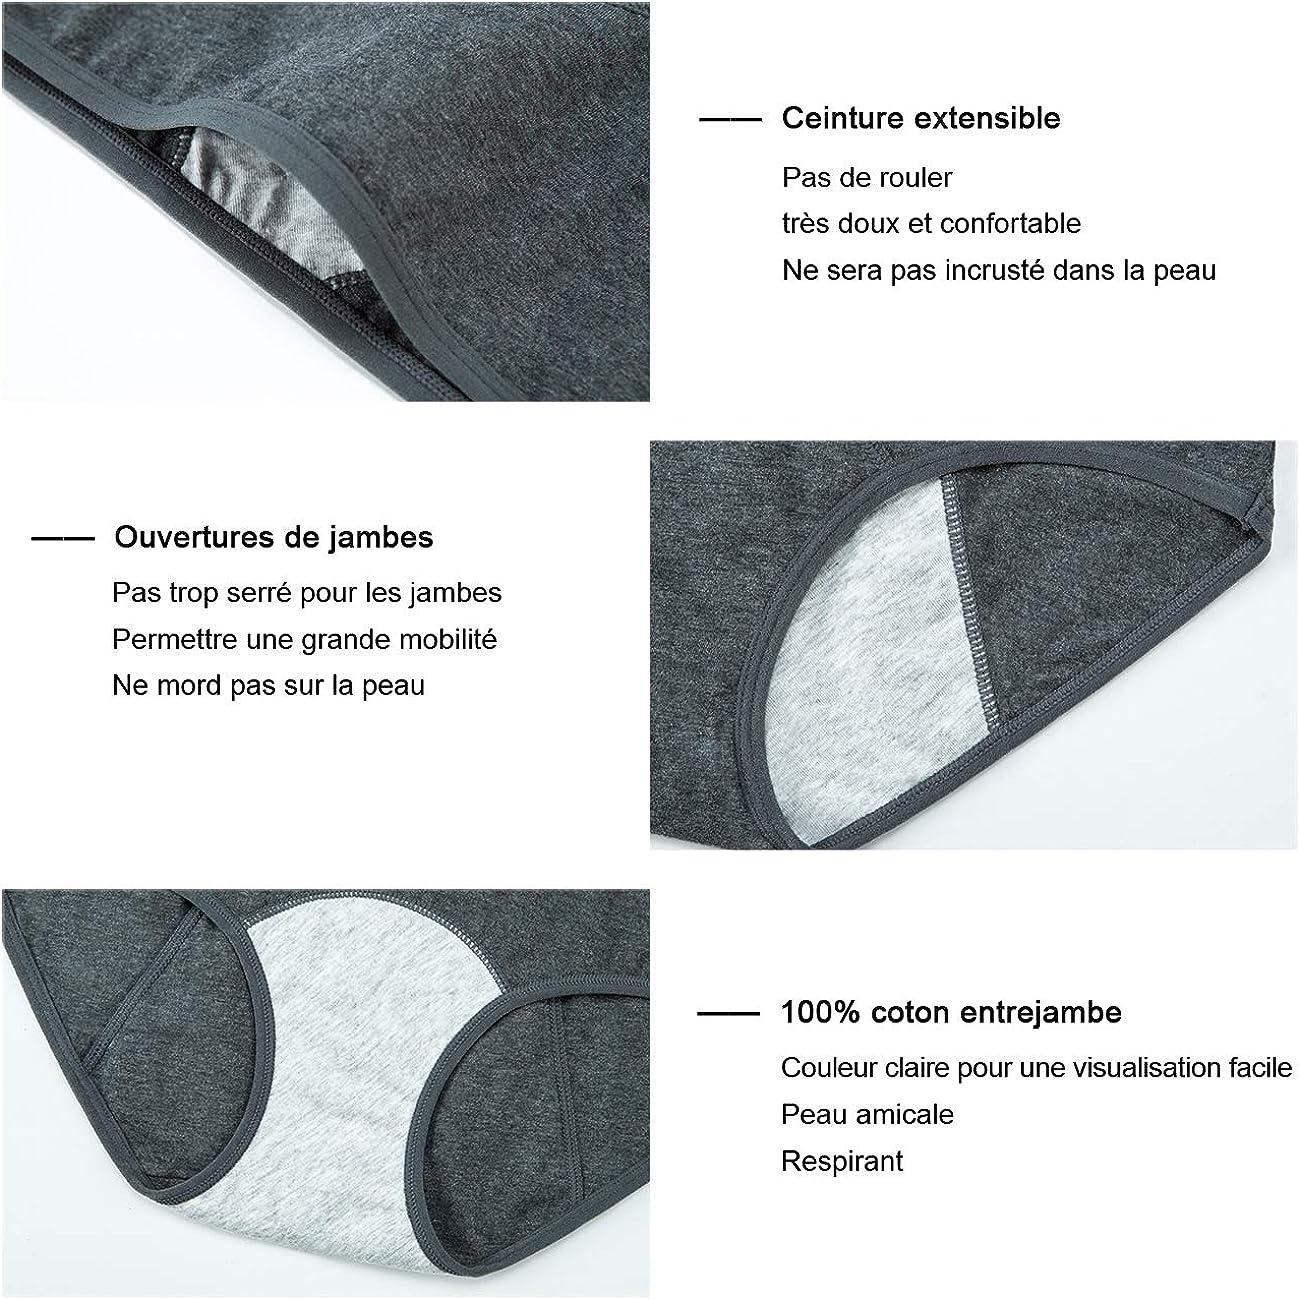 INNERSY Femme Culottes Menstruelles Absorbante Coton Anti Fuite Regles Lot de 3